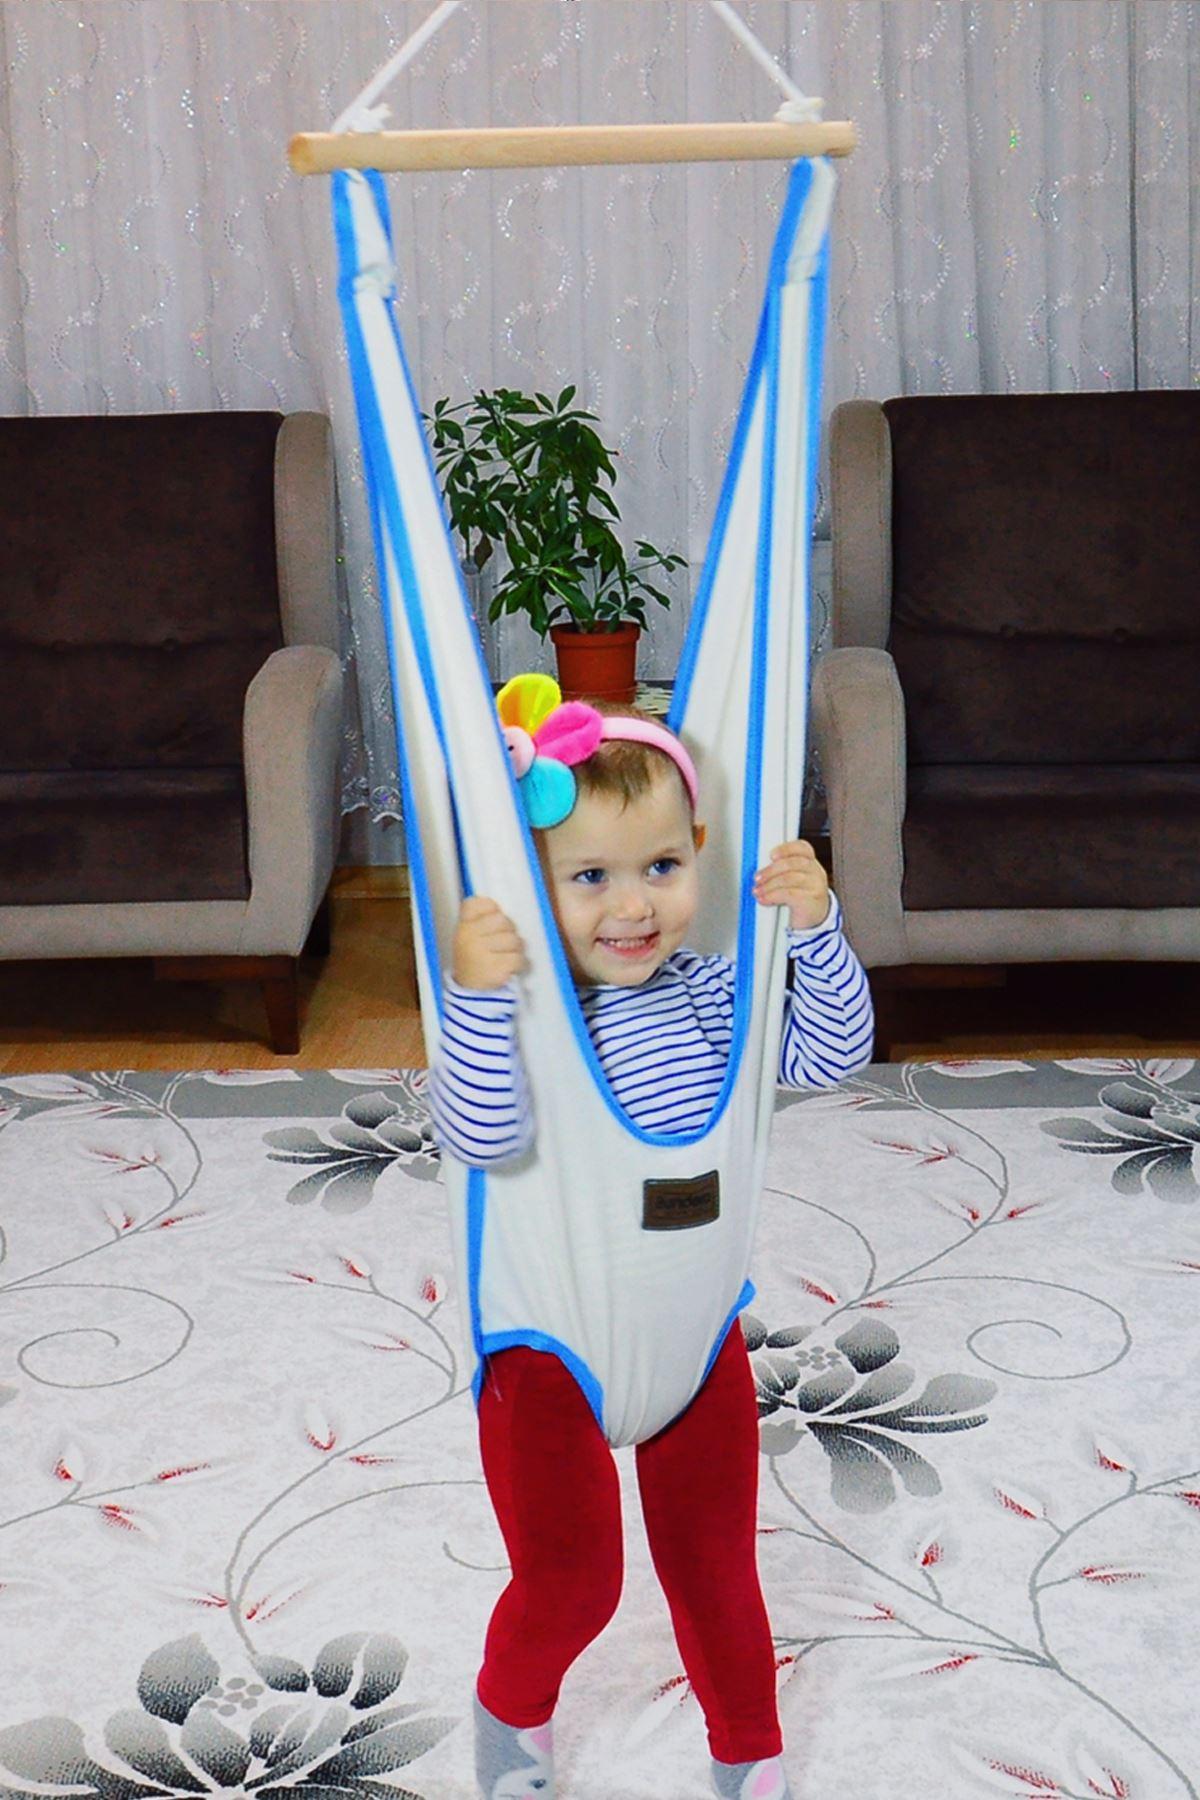 Bundera Luna Mavi Bebek Hoppala Zıpzıp Yürüteç